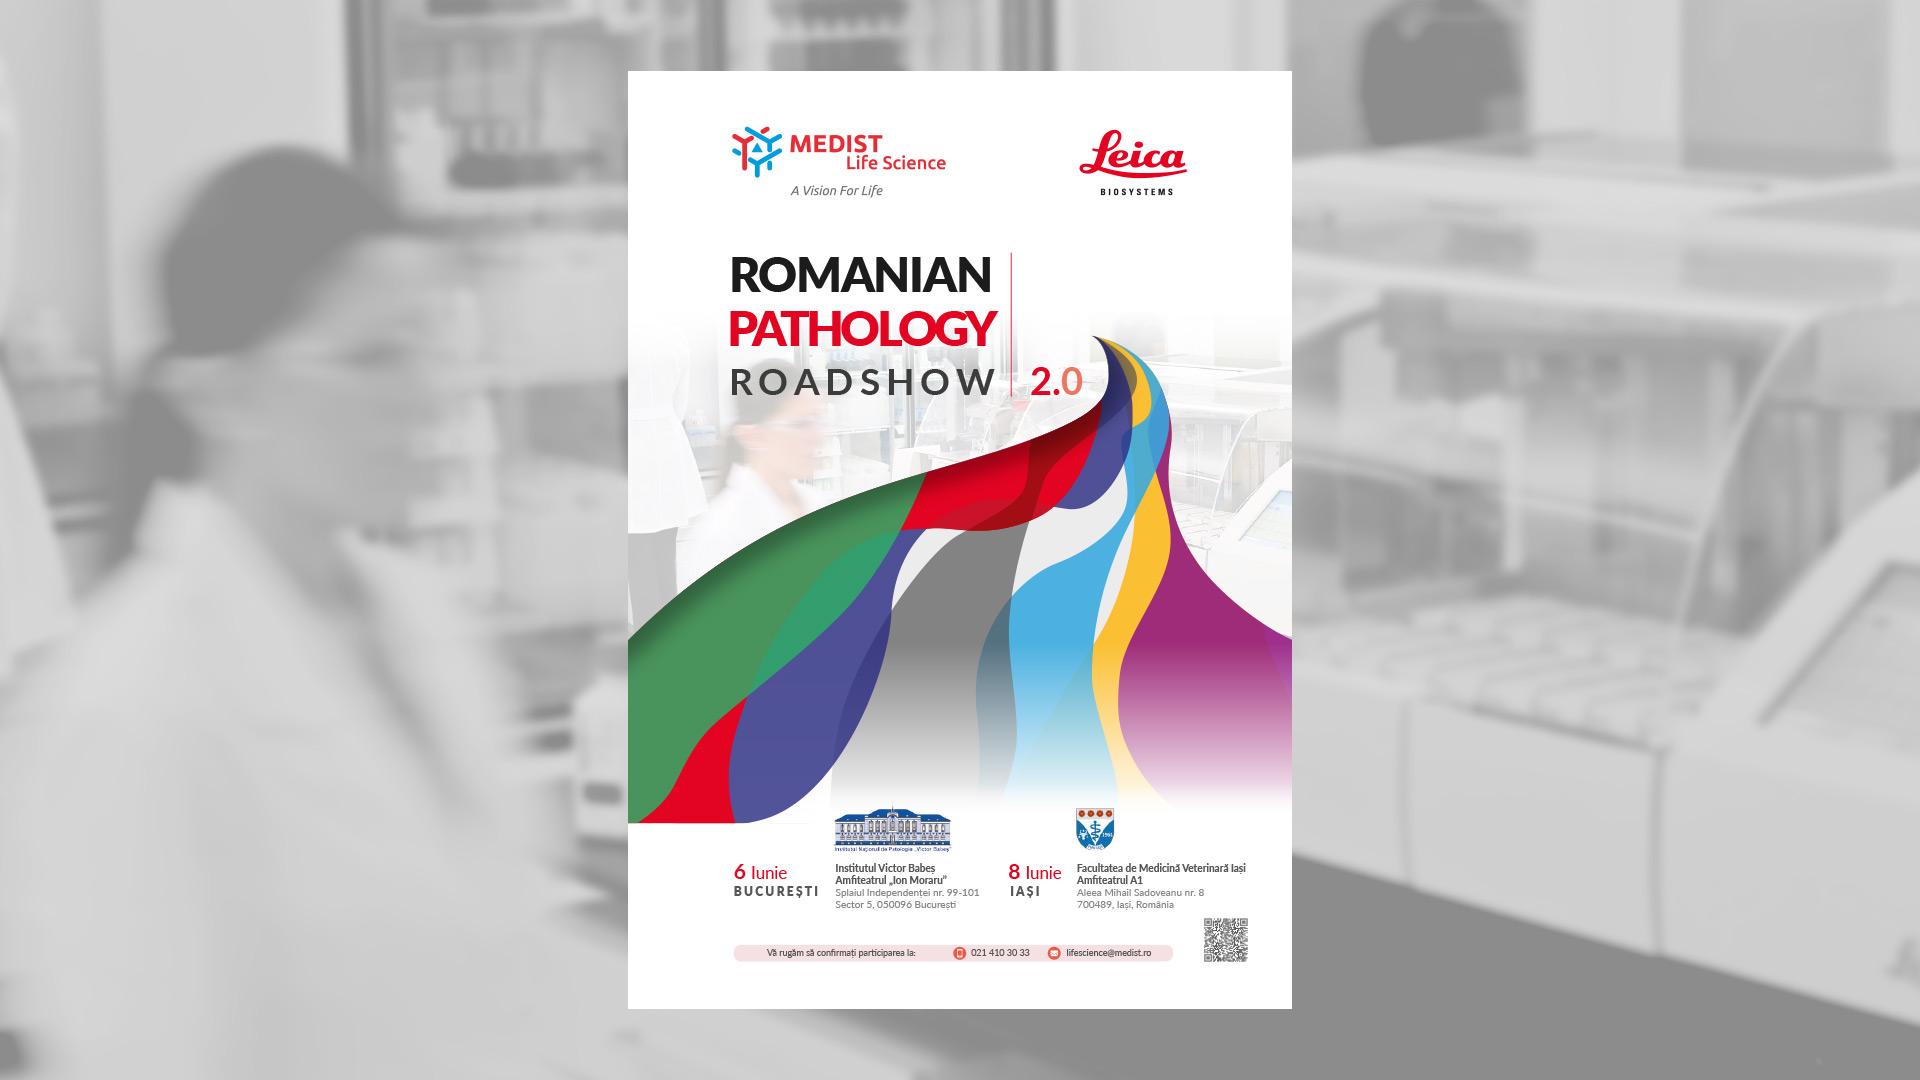 Romanian Pathology Roadshow poster